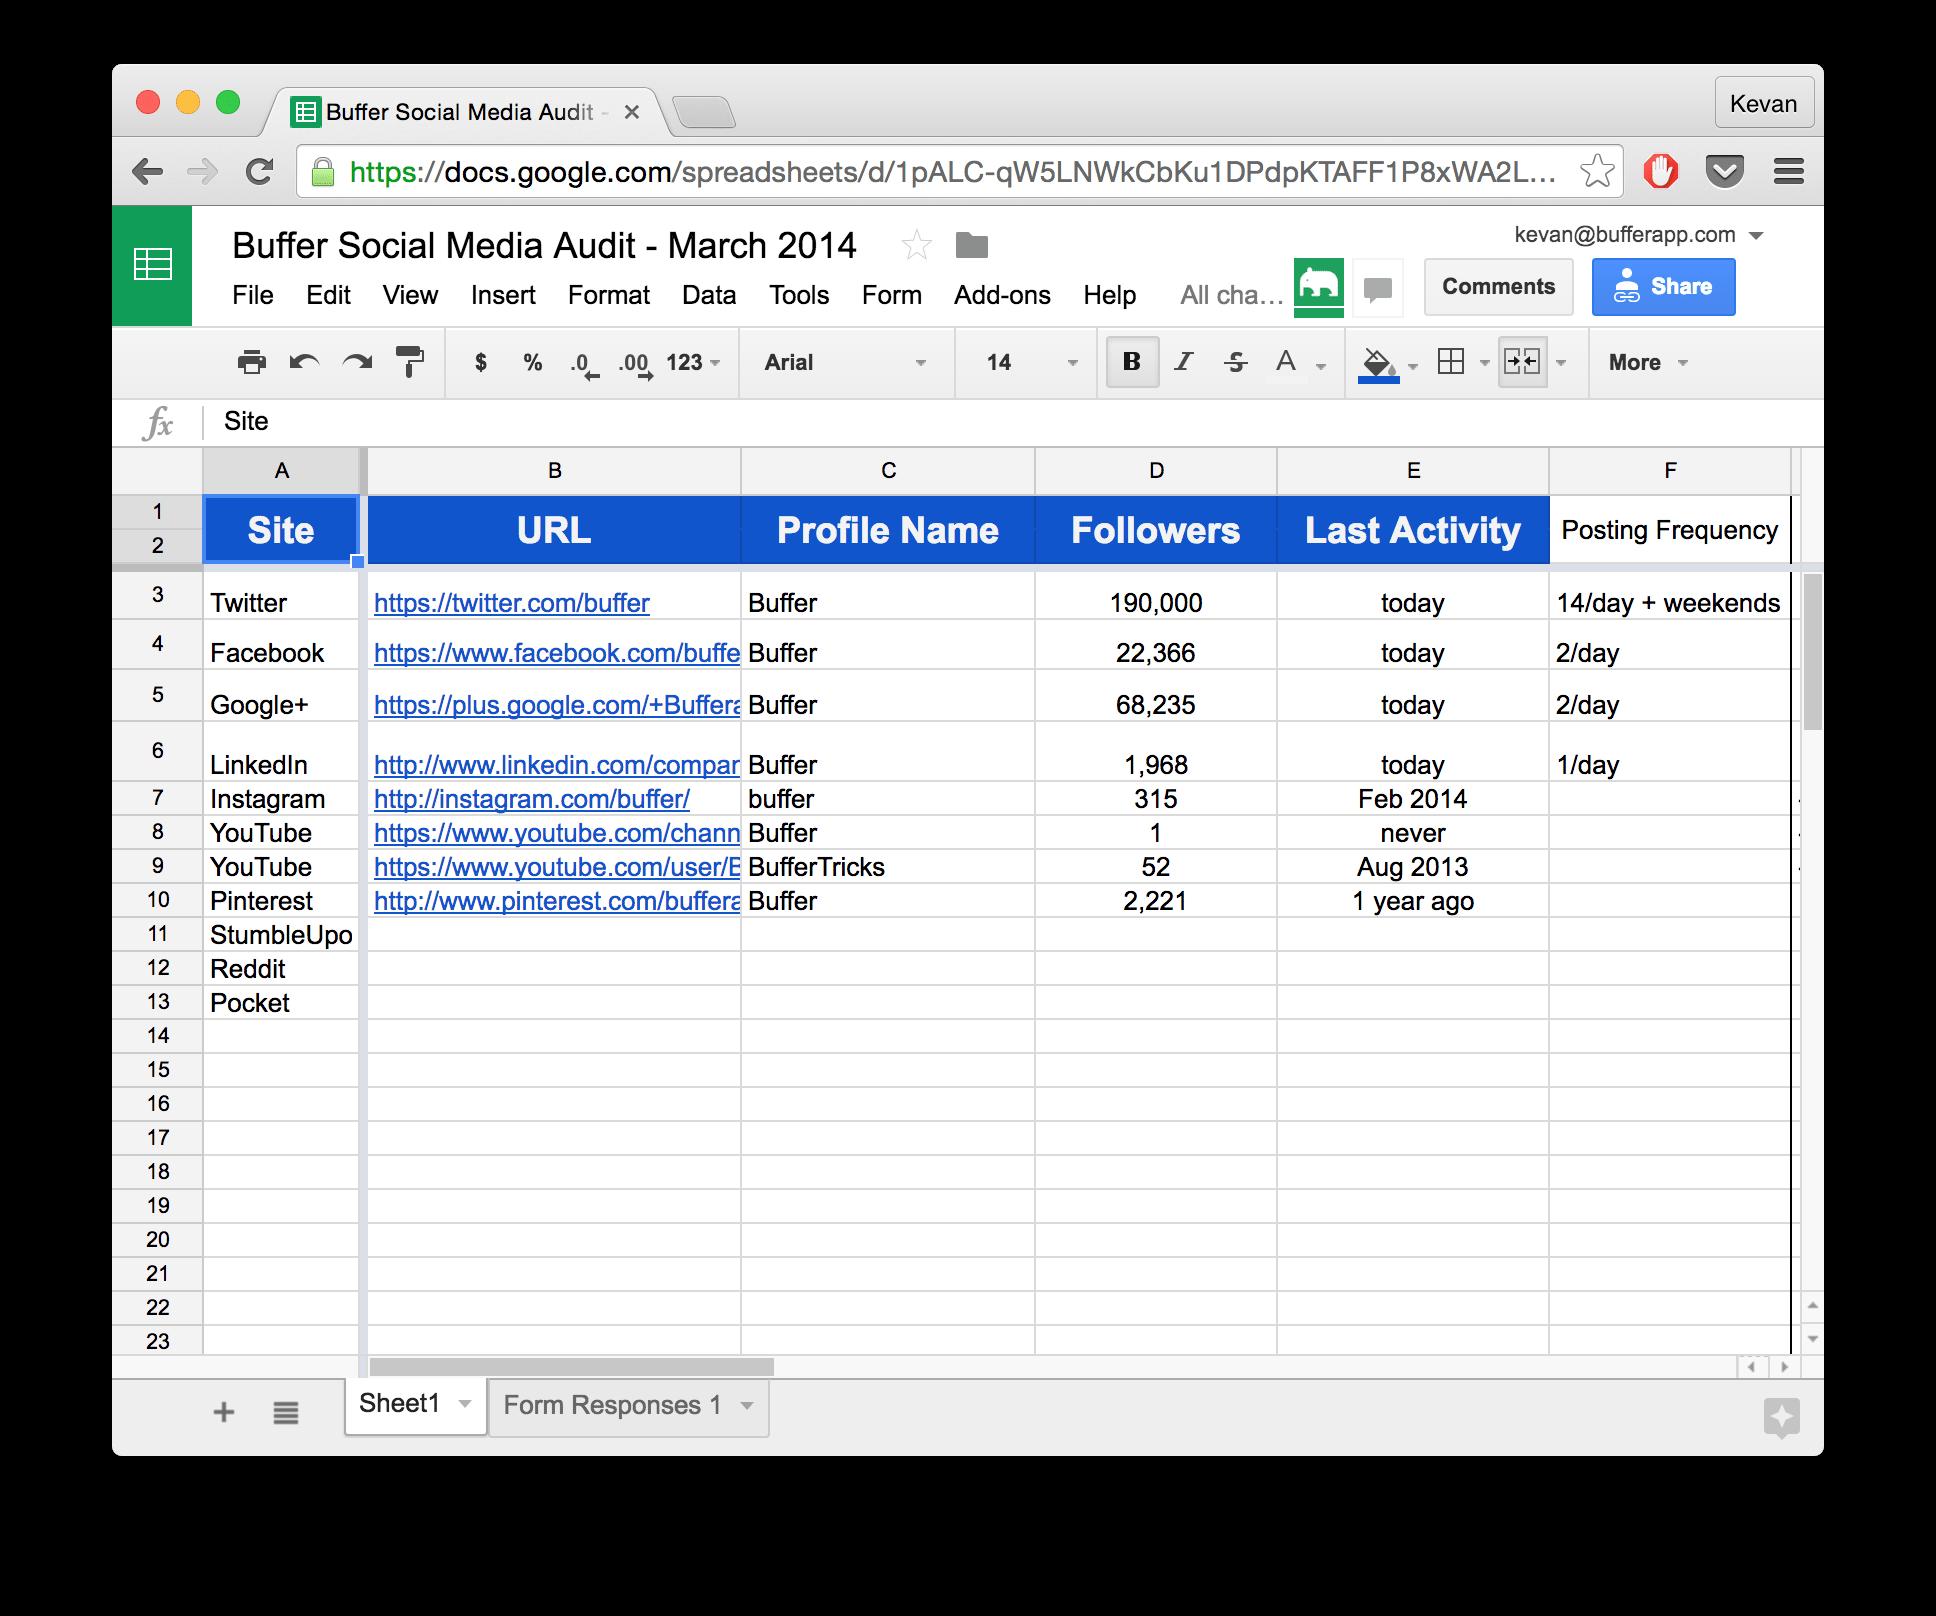 Social media audit spreadsheet template